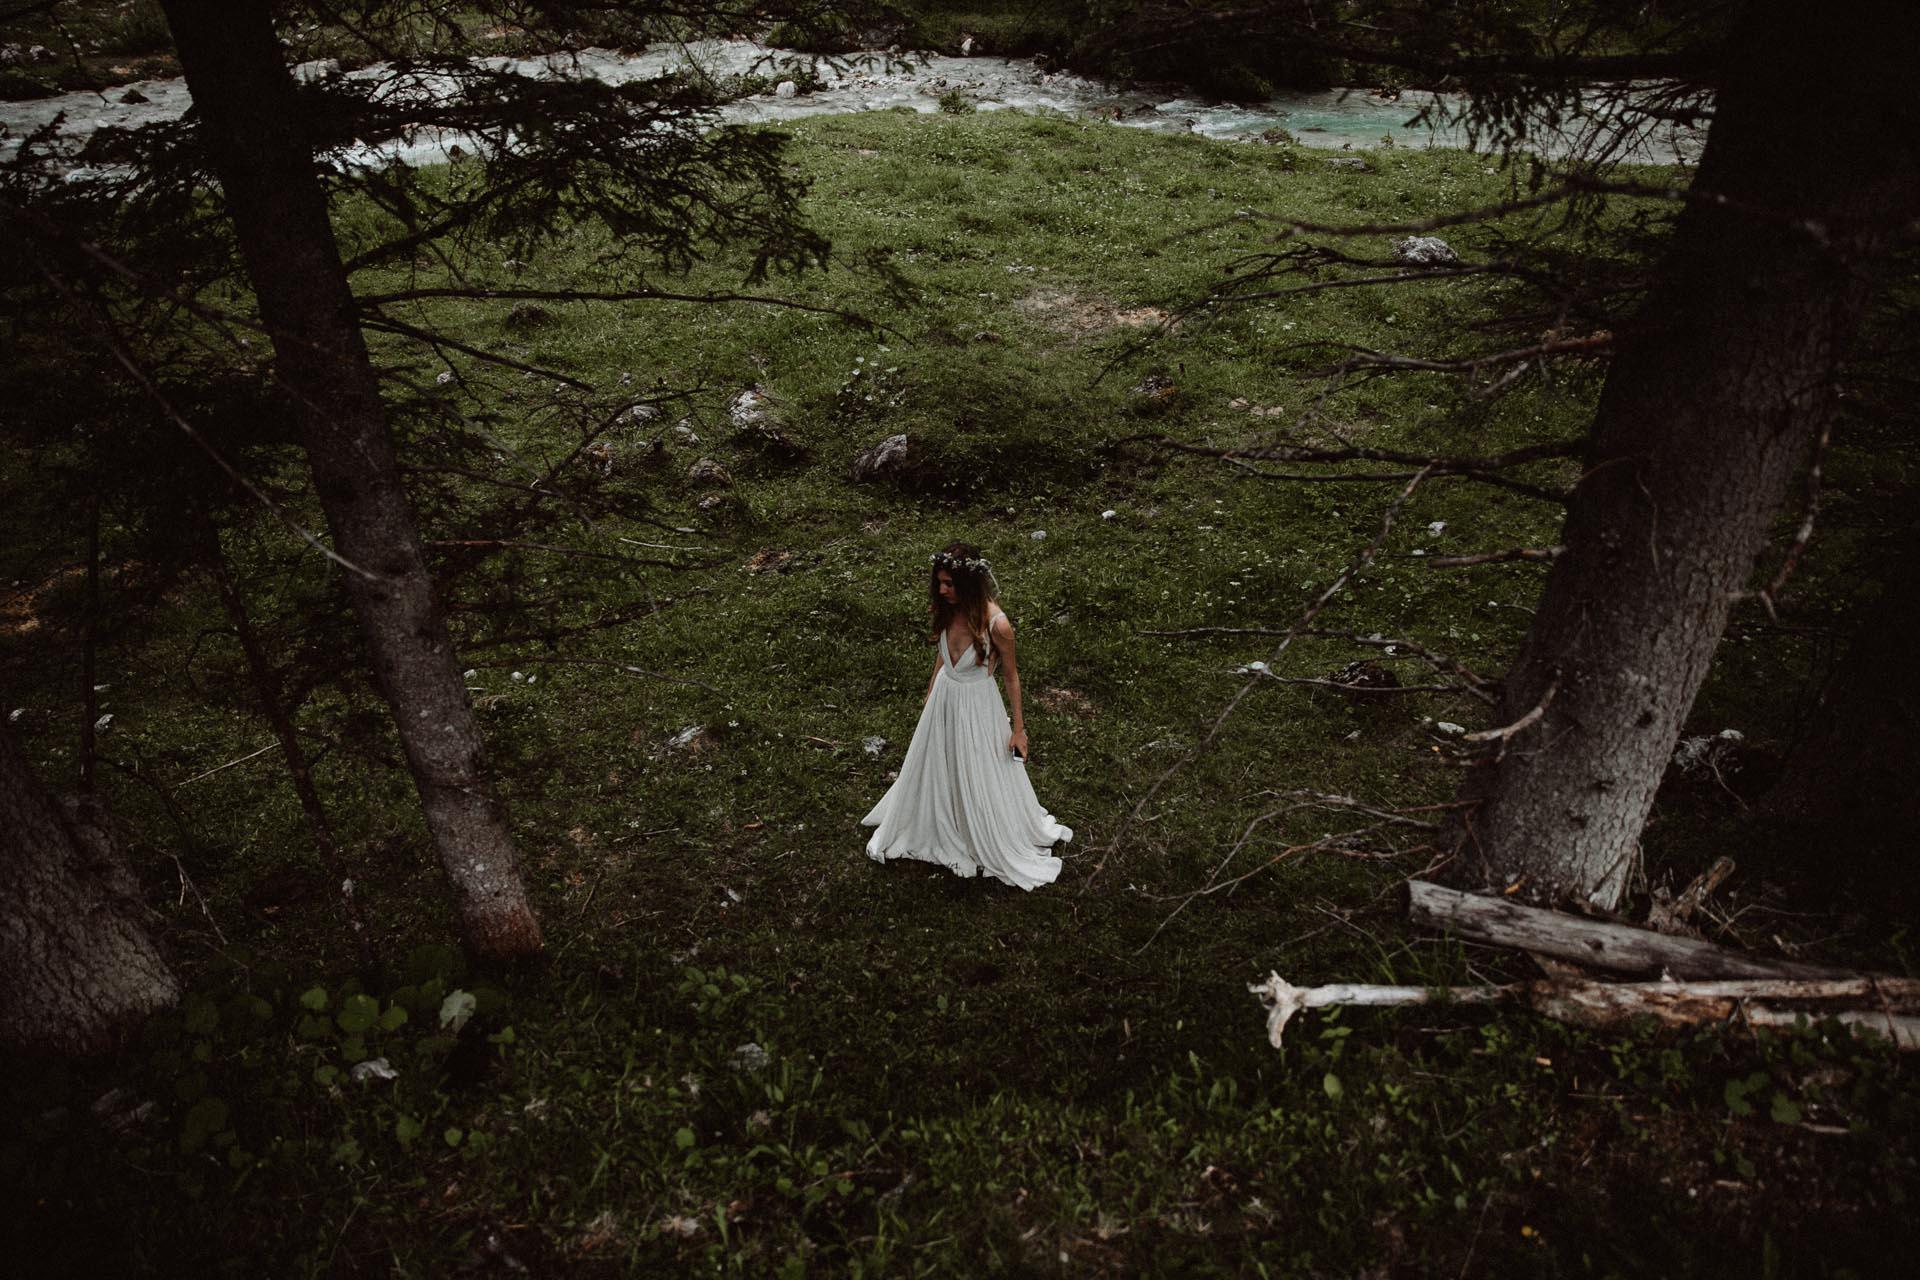 vienna-wedding-photographer-agnesundandi-weddingshooting-schladming-219